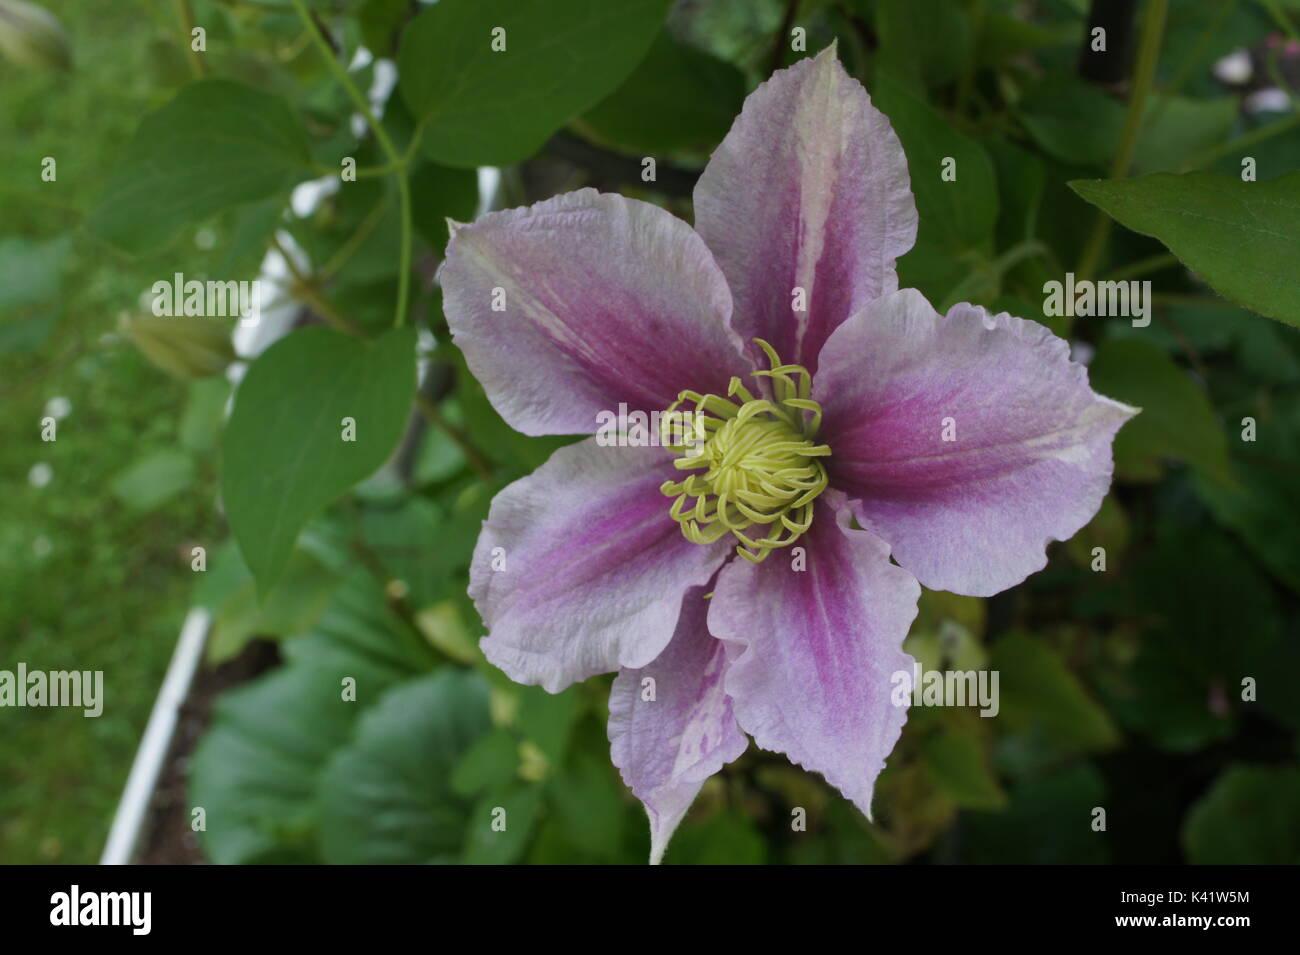 white clematis flower blossom stock photos amp white